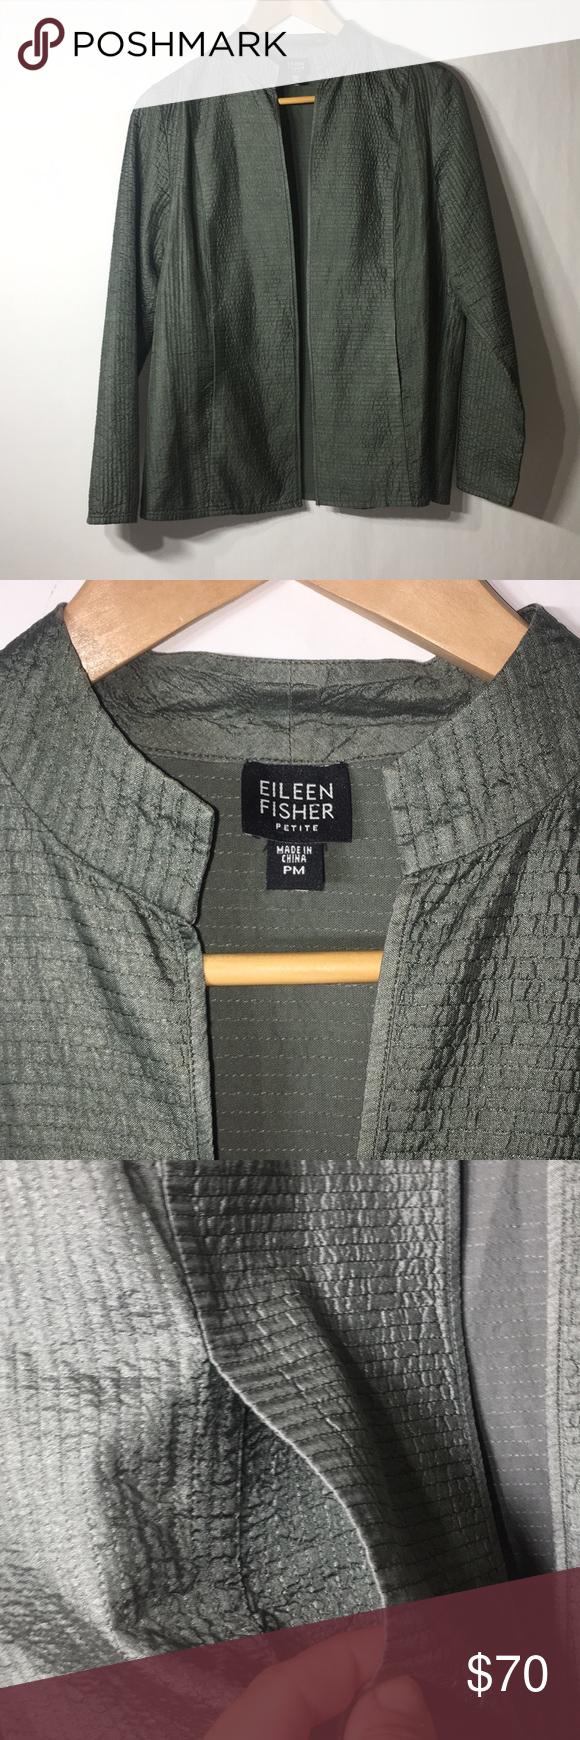 Eileen Fisher Silk Light Weight Open Jacket Pocket Approx 25 Long 22 Armpit To Armpit Pockets Euc Pre Eileen Fisher Jacket Eileen Fisher High Collar Jacket [ 1740 x 580 Pixel ]